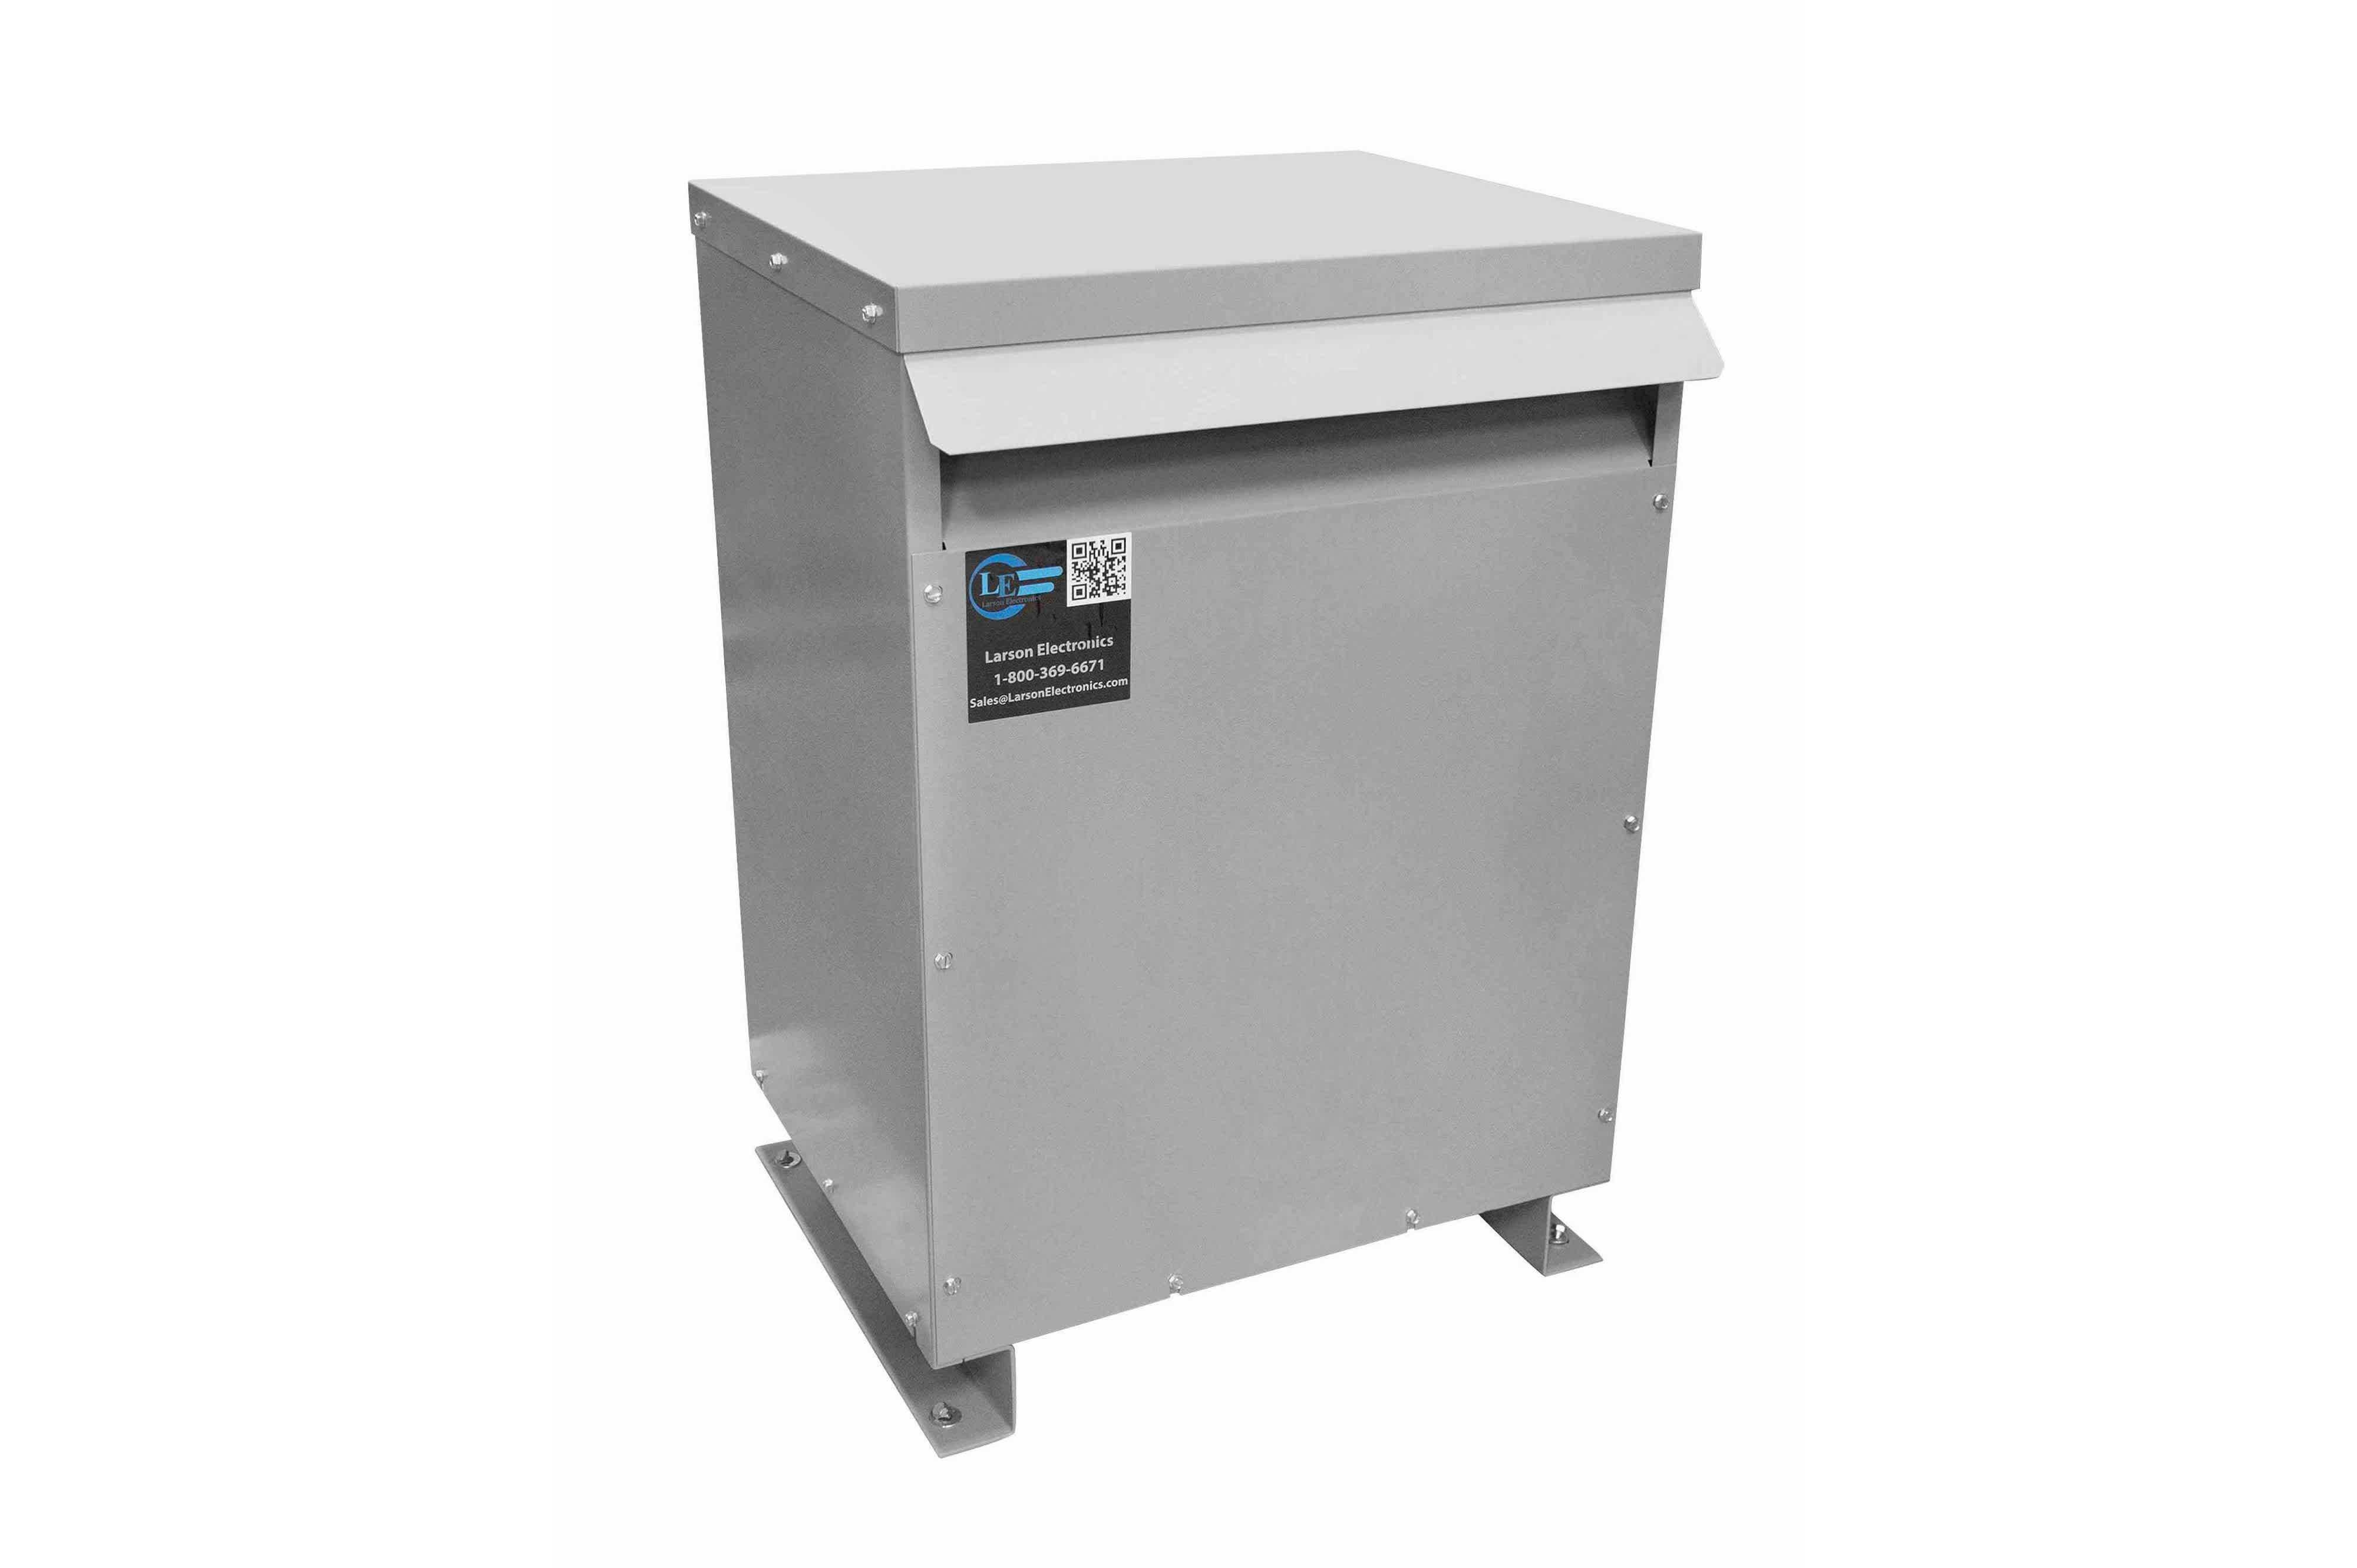 36 kVA 3PH Isolation Transformer, 208V Wye Primary, 480Y/277 Wye-N Secondary, N3R, Ventilated, 60 Hz